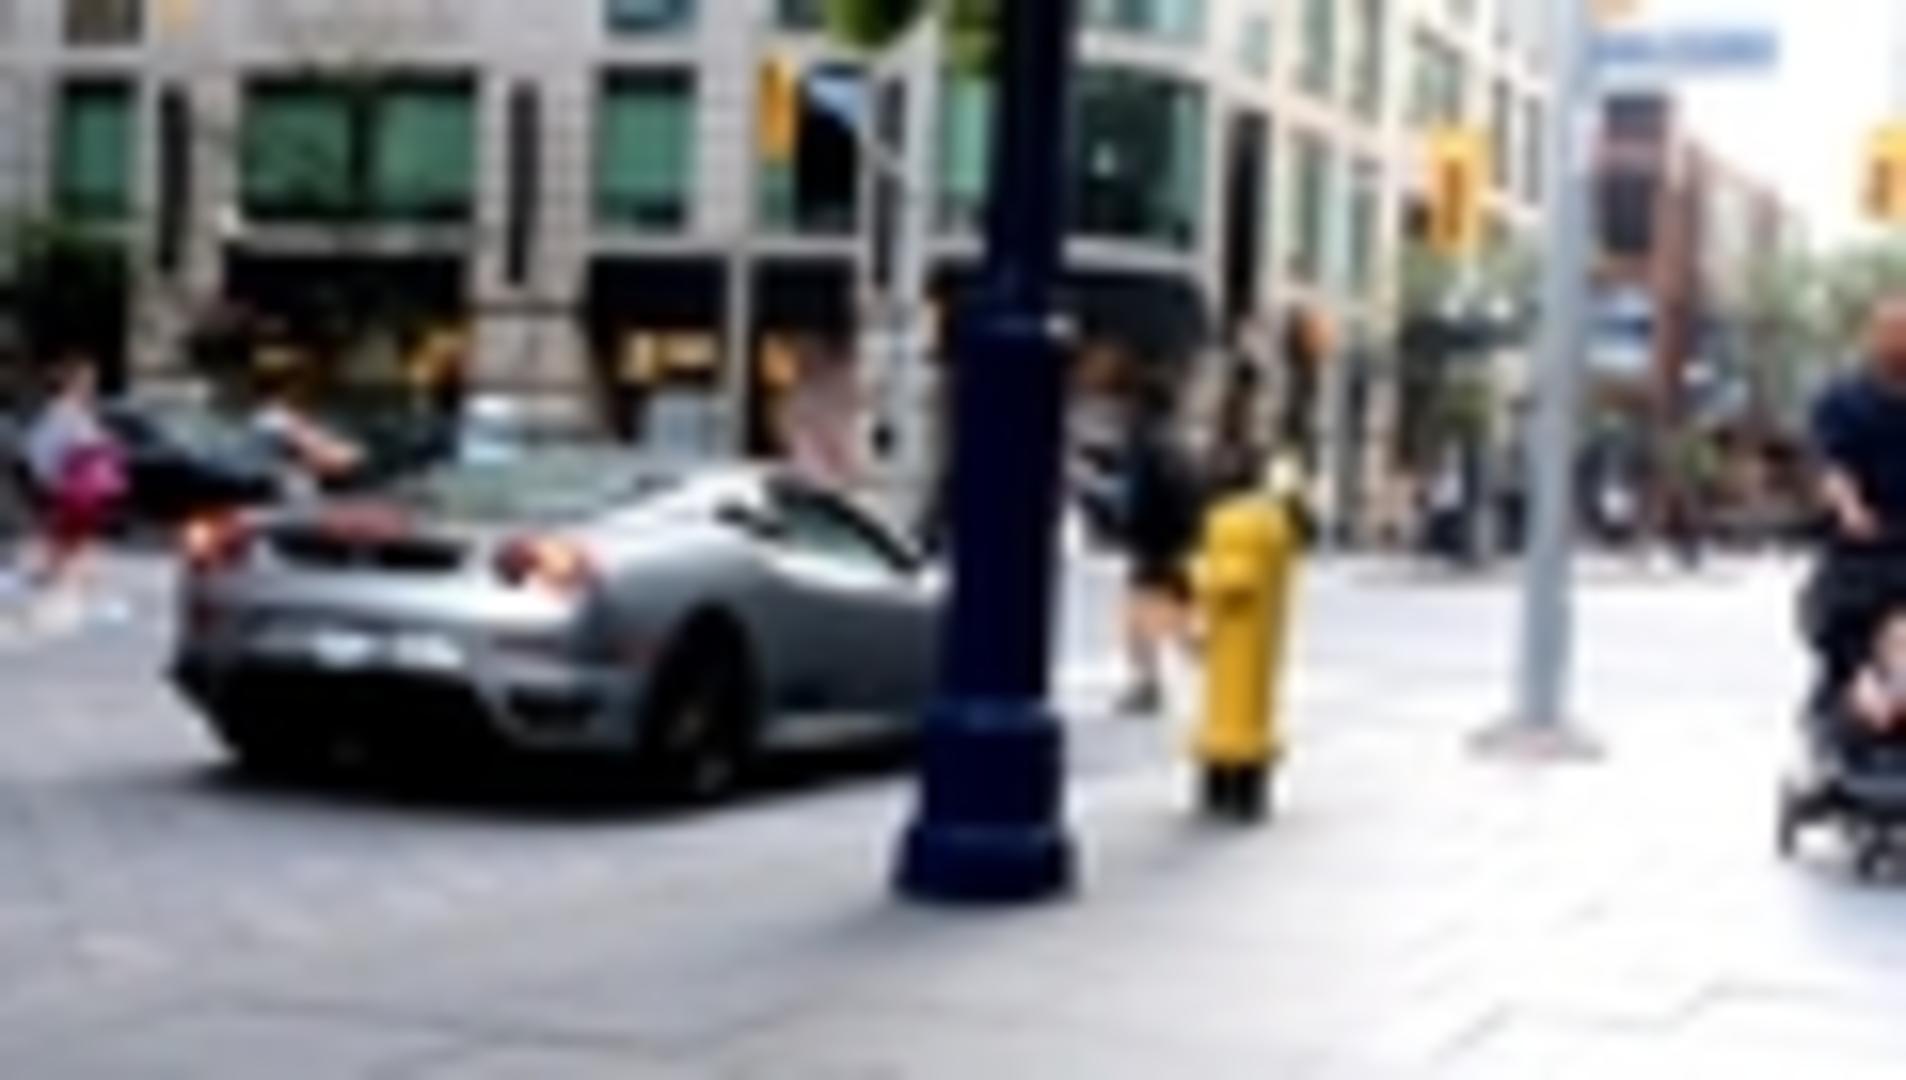 Ferrari Scares Girl Annoyed by Loud Engine | Jukin Media Inc